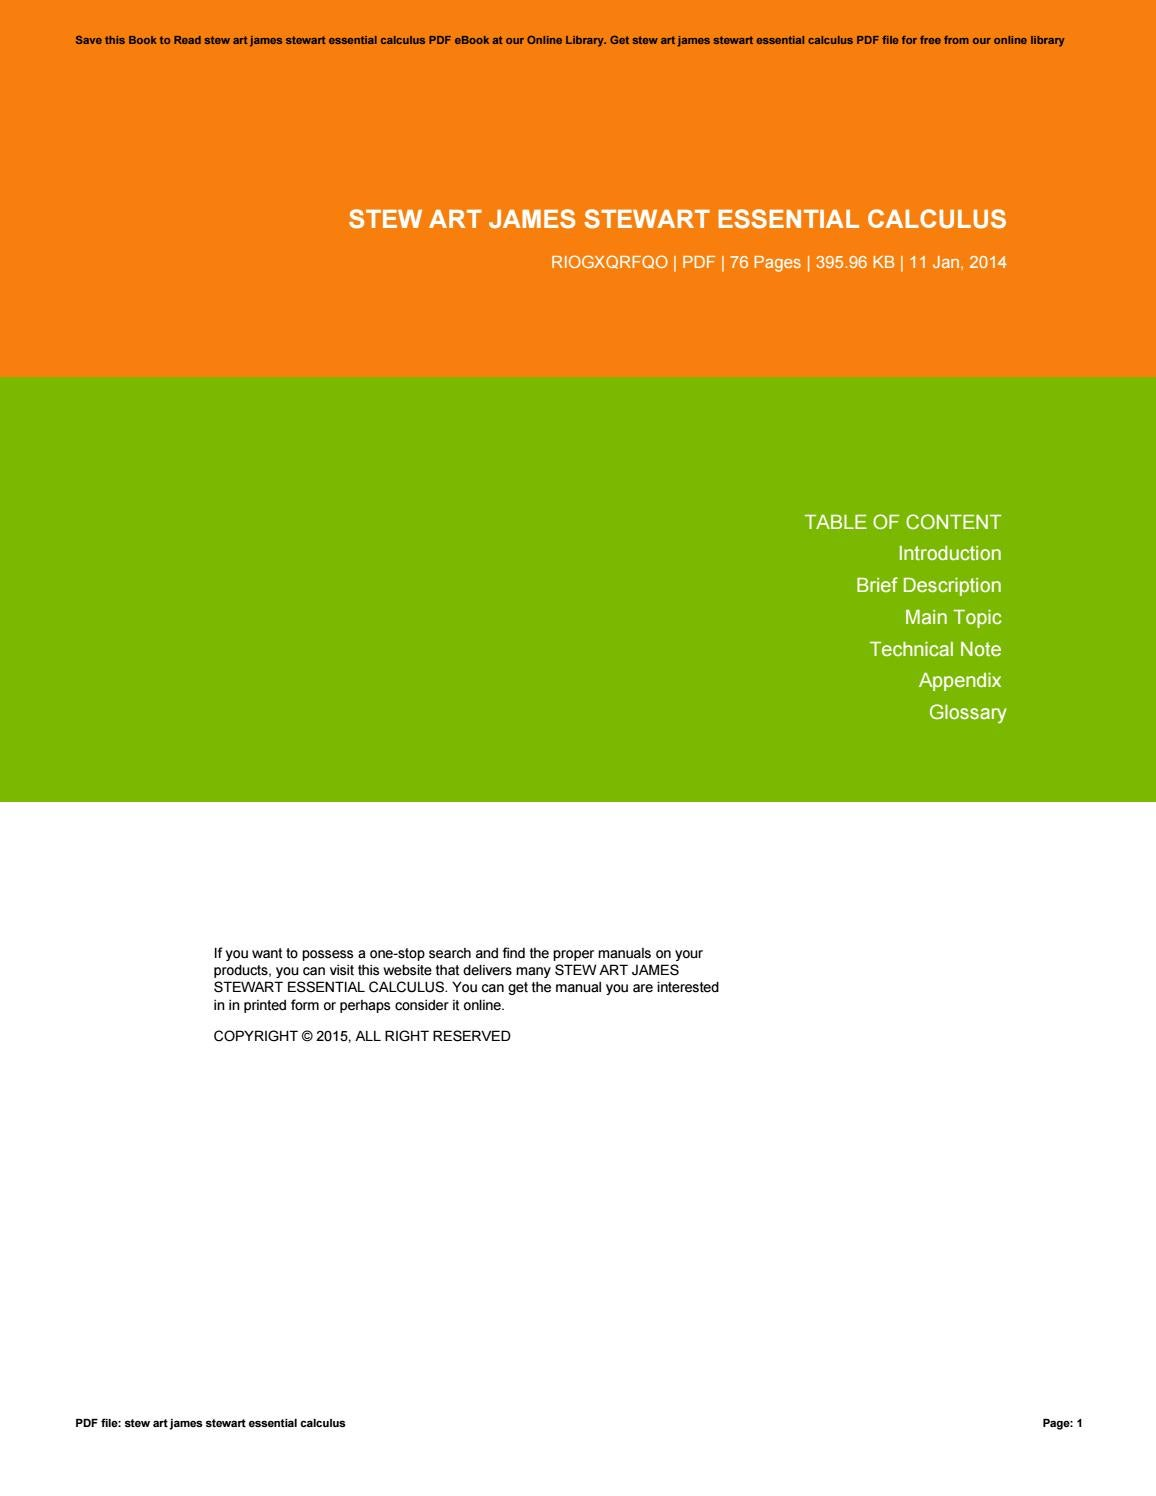 Essential Calculus Stewart Pdf